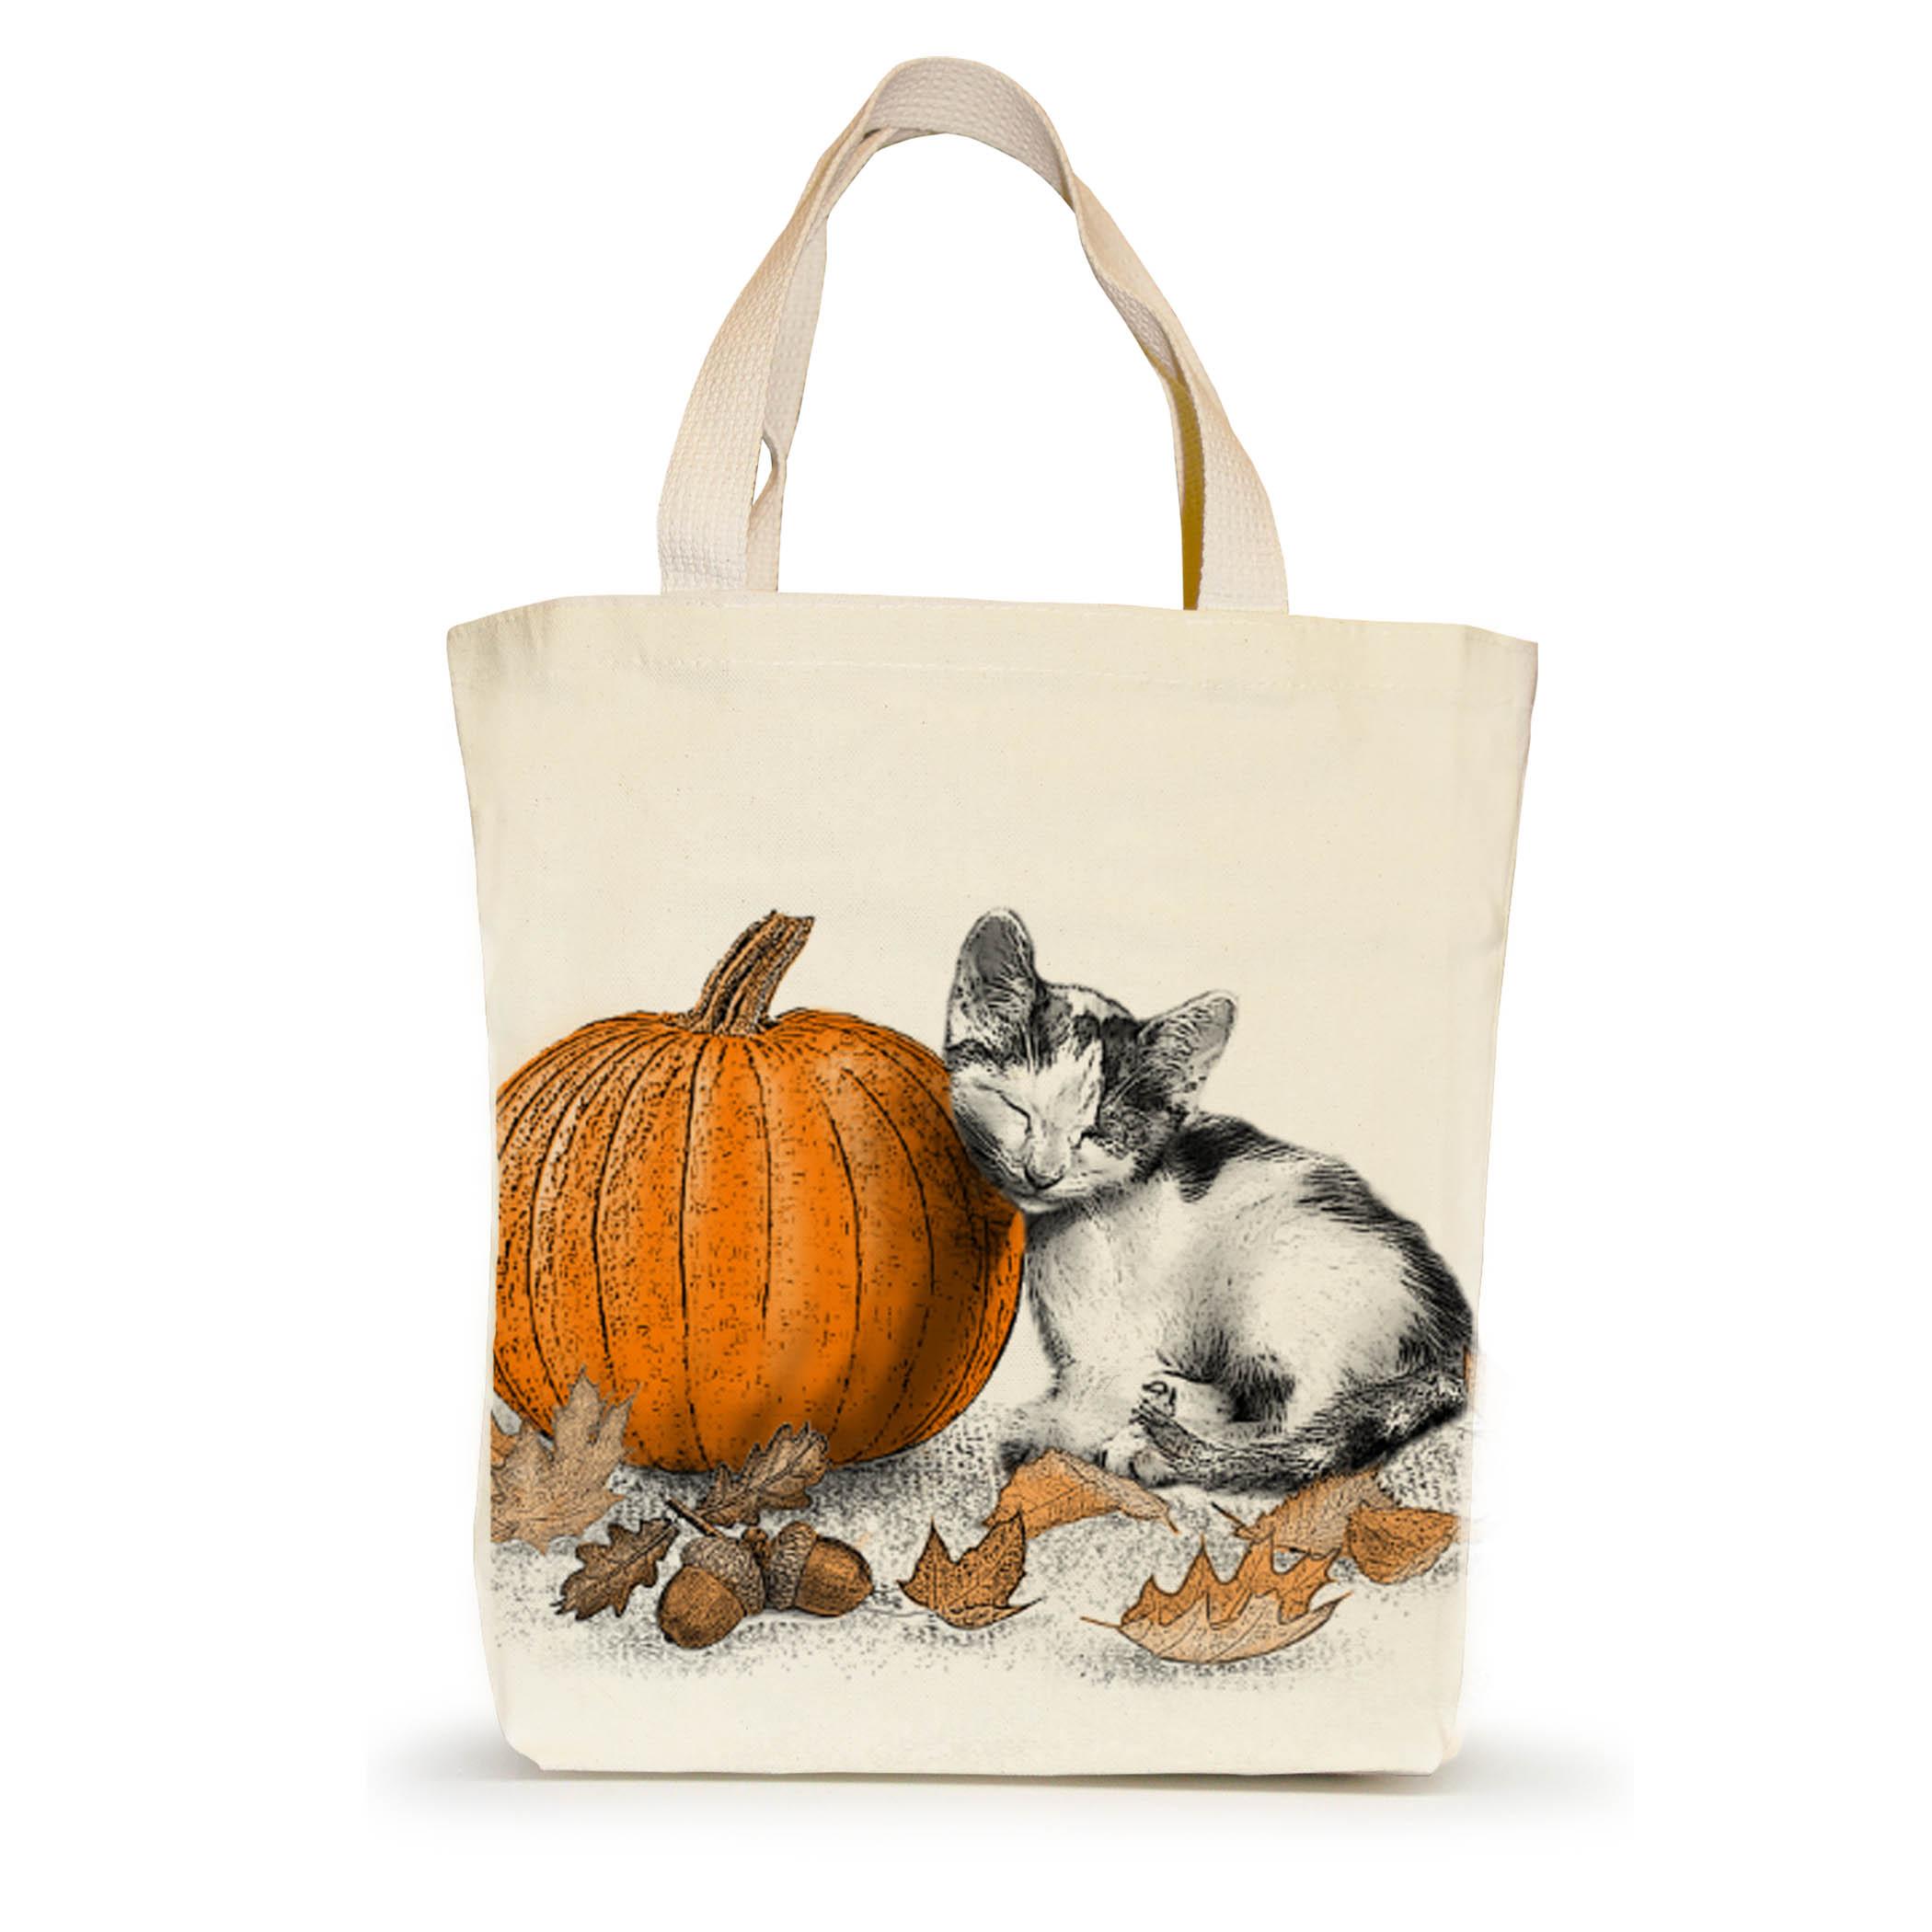 Pet Contest Cat_ST_Kiki with Pumpkin_PRODUCTSHOT_CK[6093]